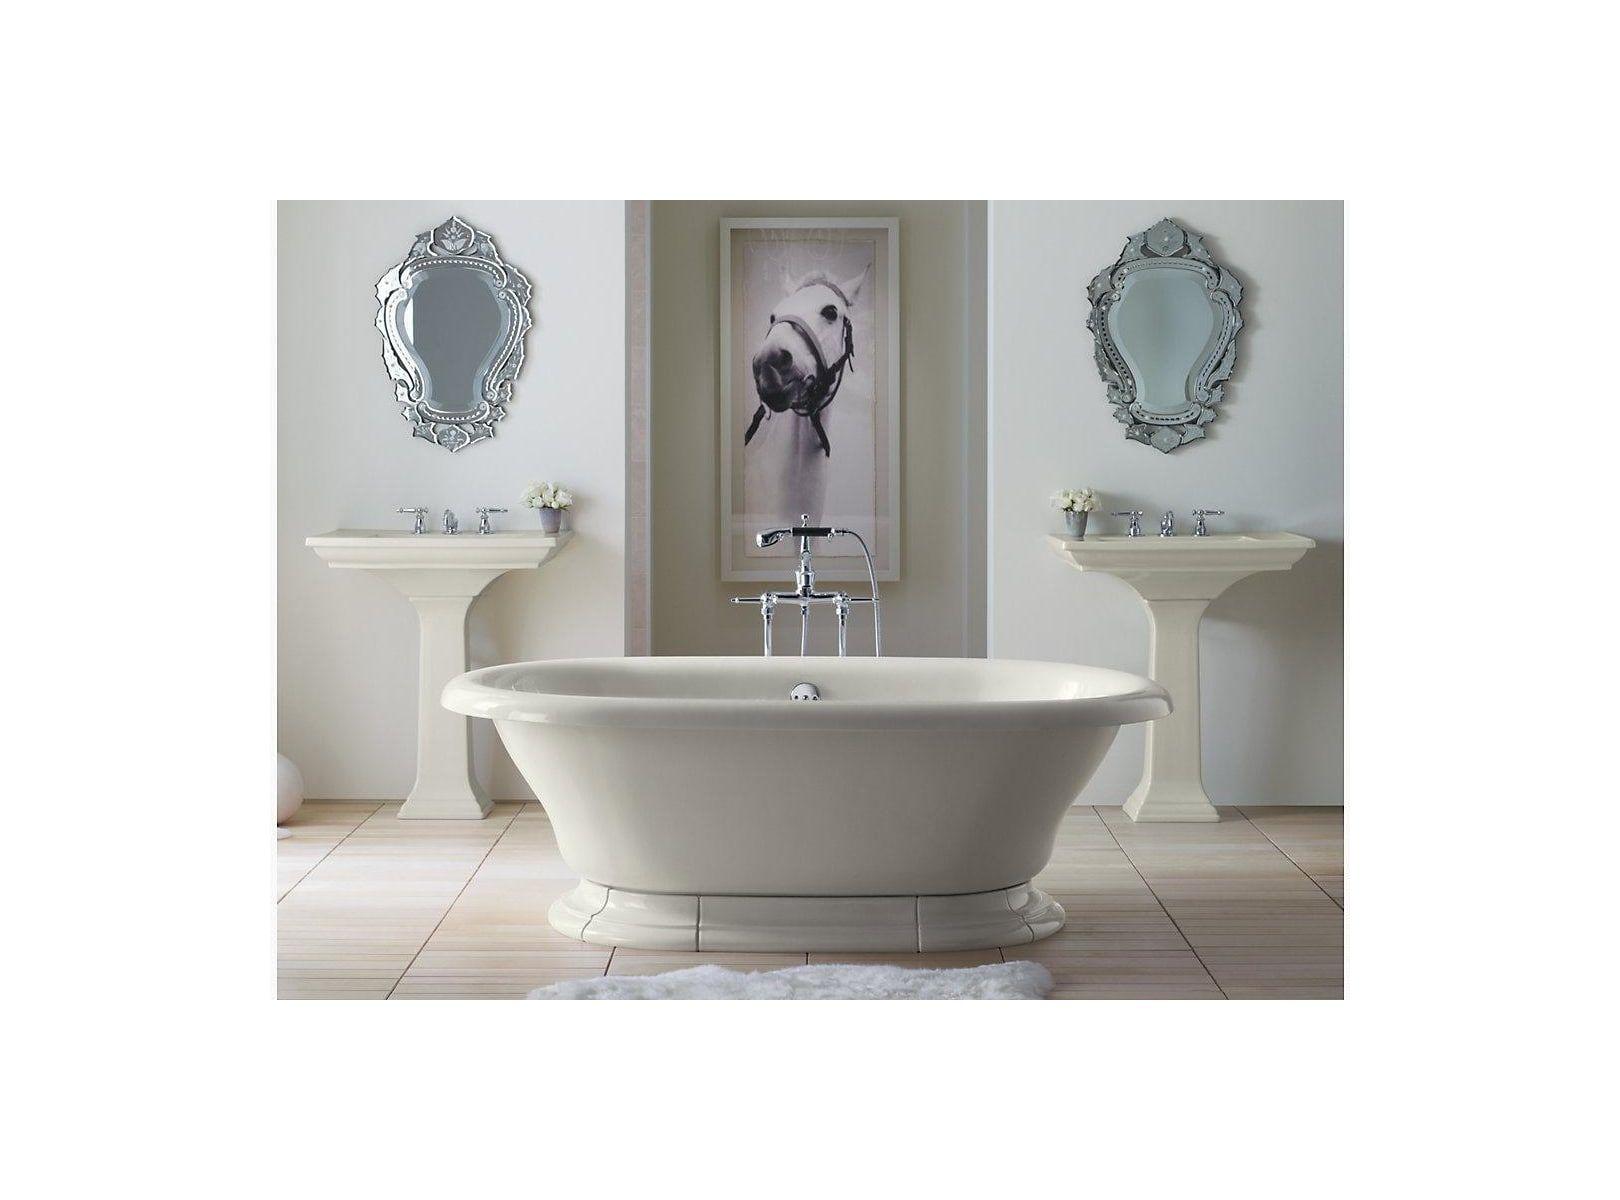 Kohler K 700 Vintage Collection 72 Free Standing Bath Tub For Two